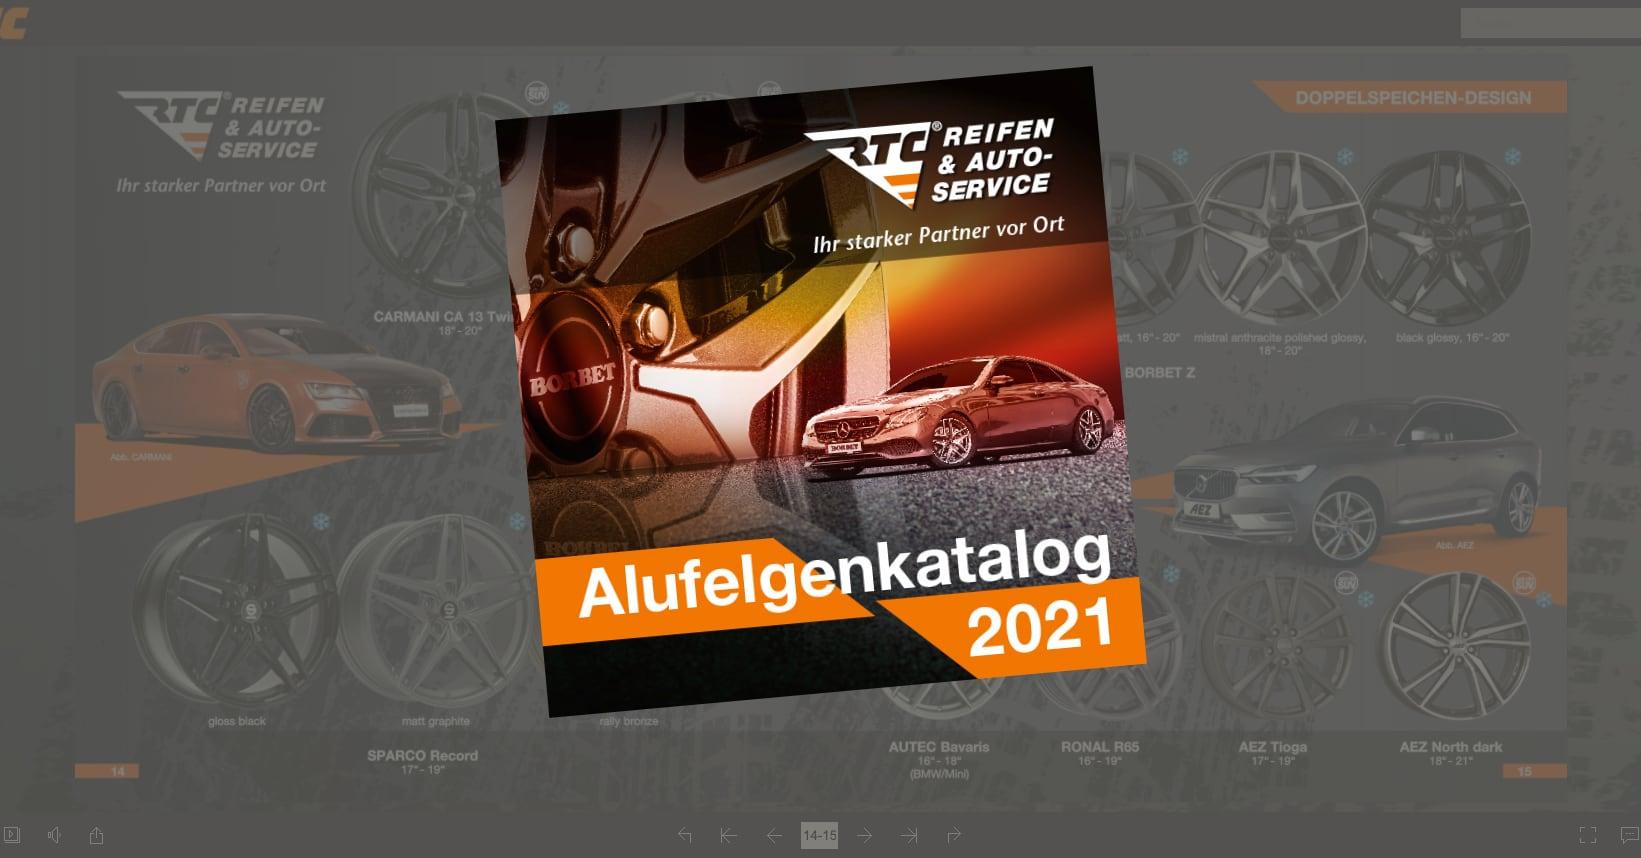 Der neue RTC Felgenkatalog 2021